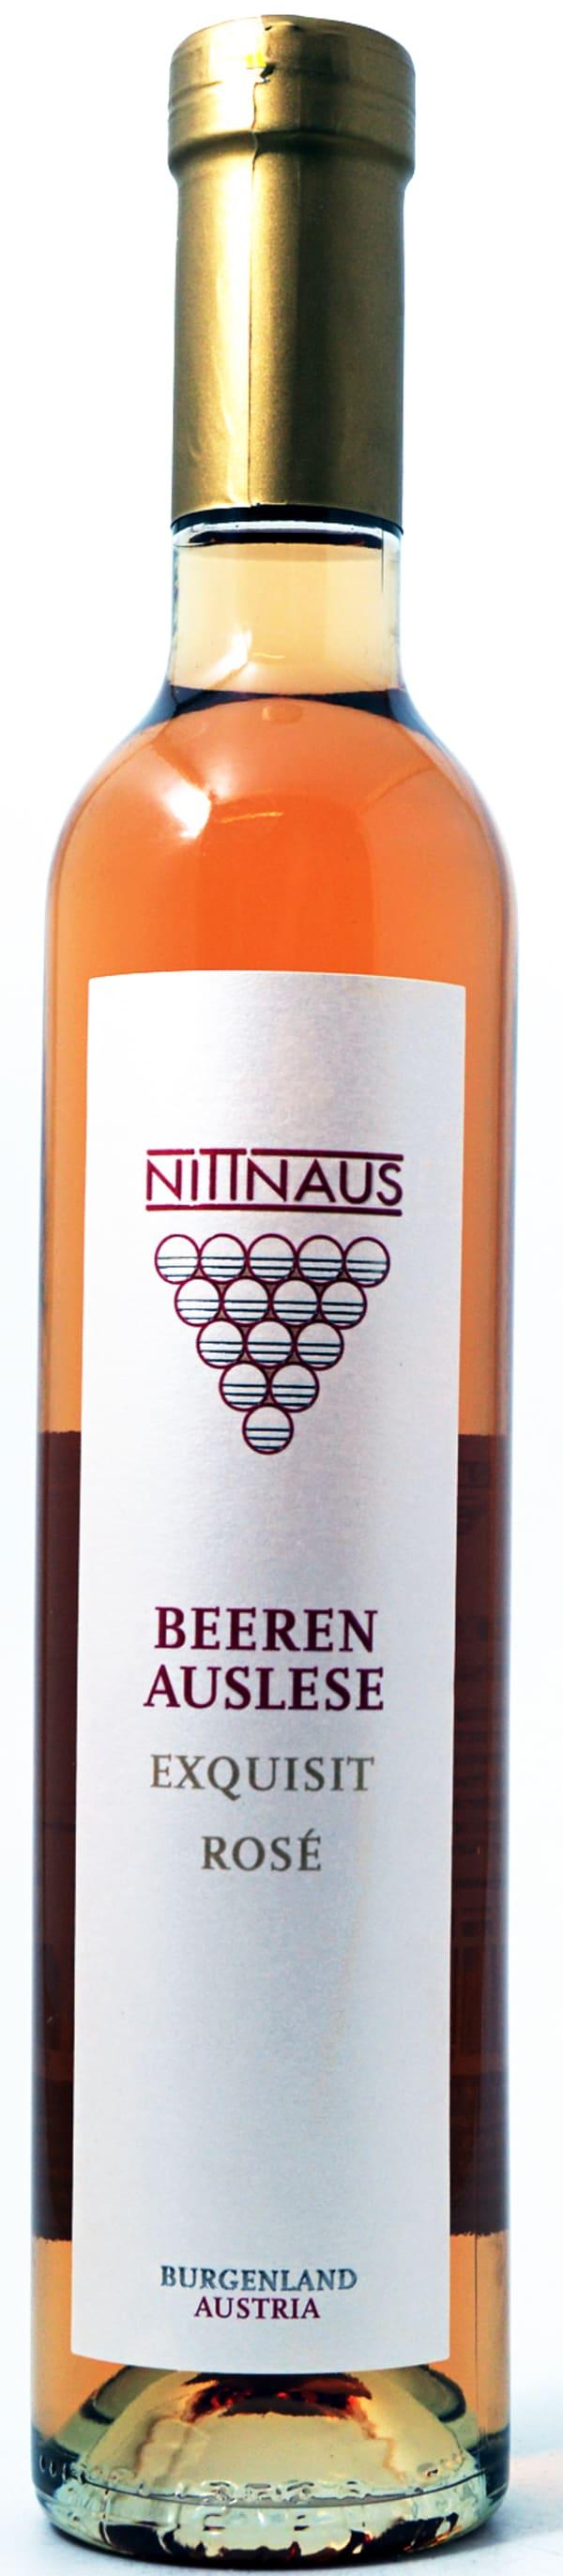 Nittnaus Beerenauslese Rosé Exquisit 2017